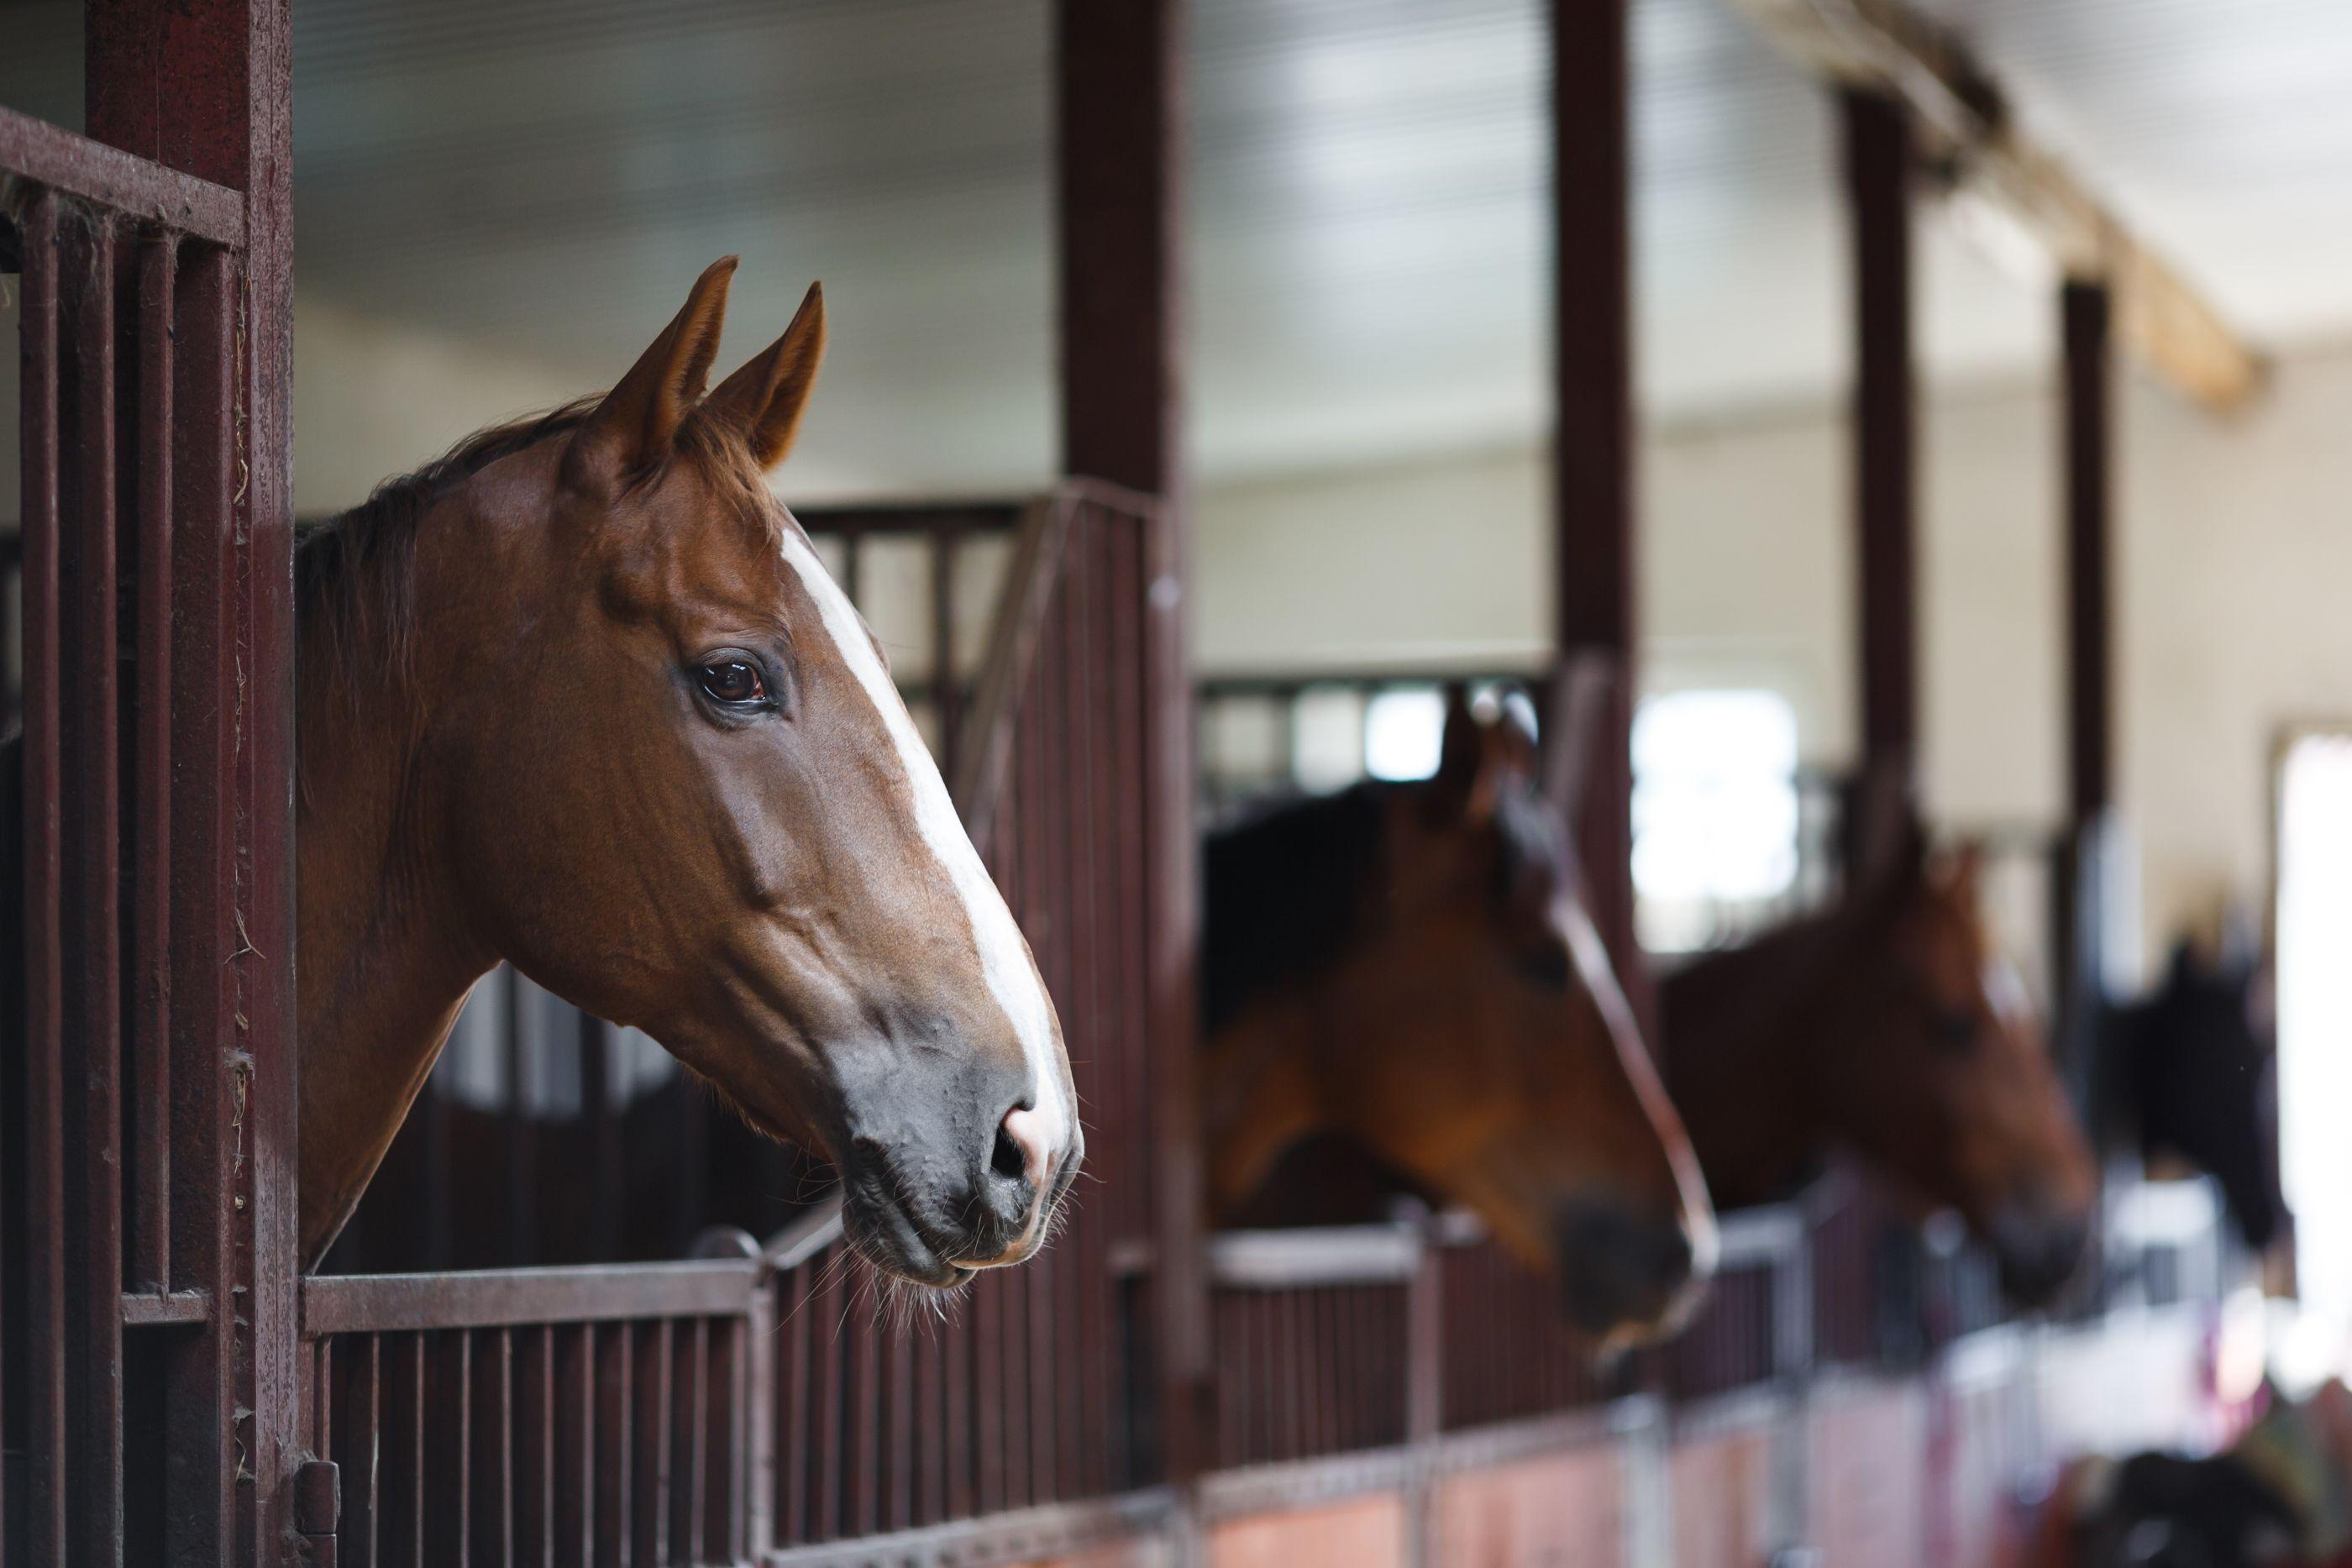 Boarding - Horses